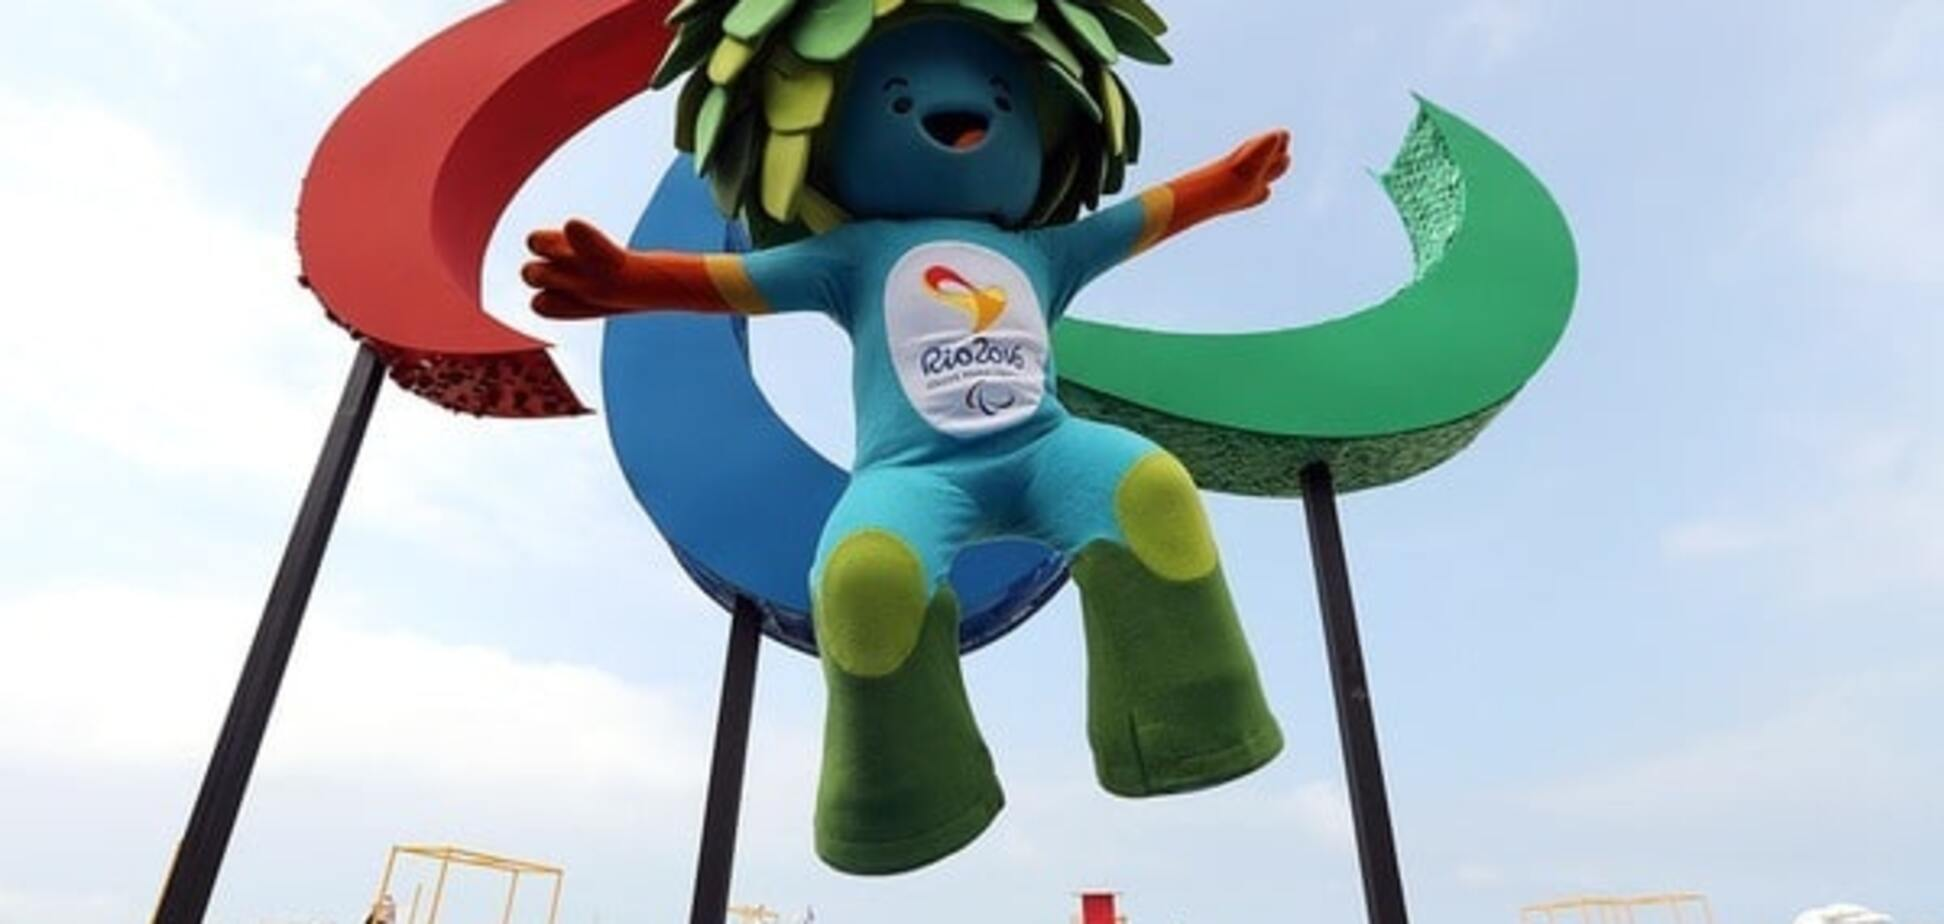 Паралимпиада-2016: медальный зачет турнира